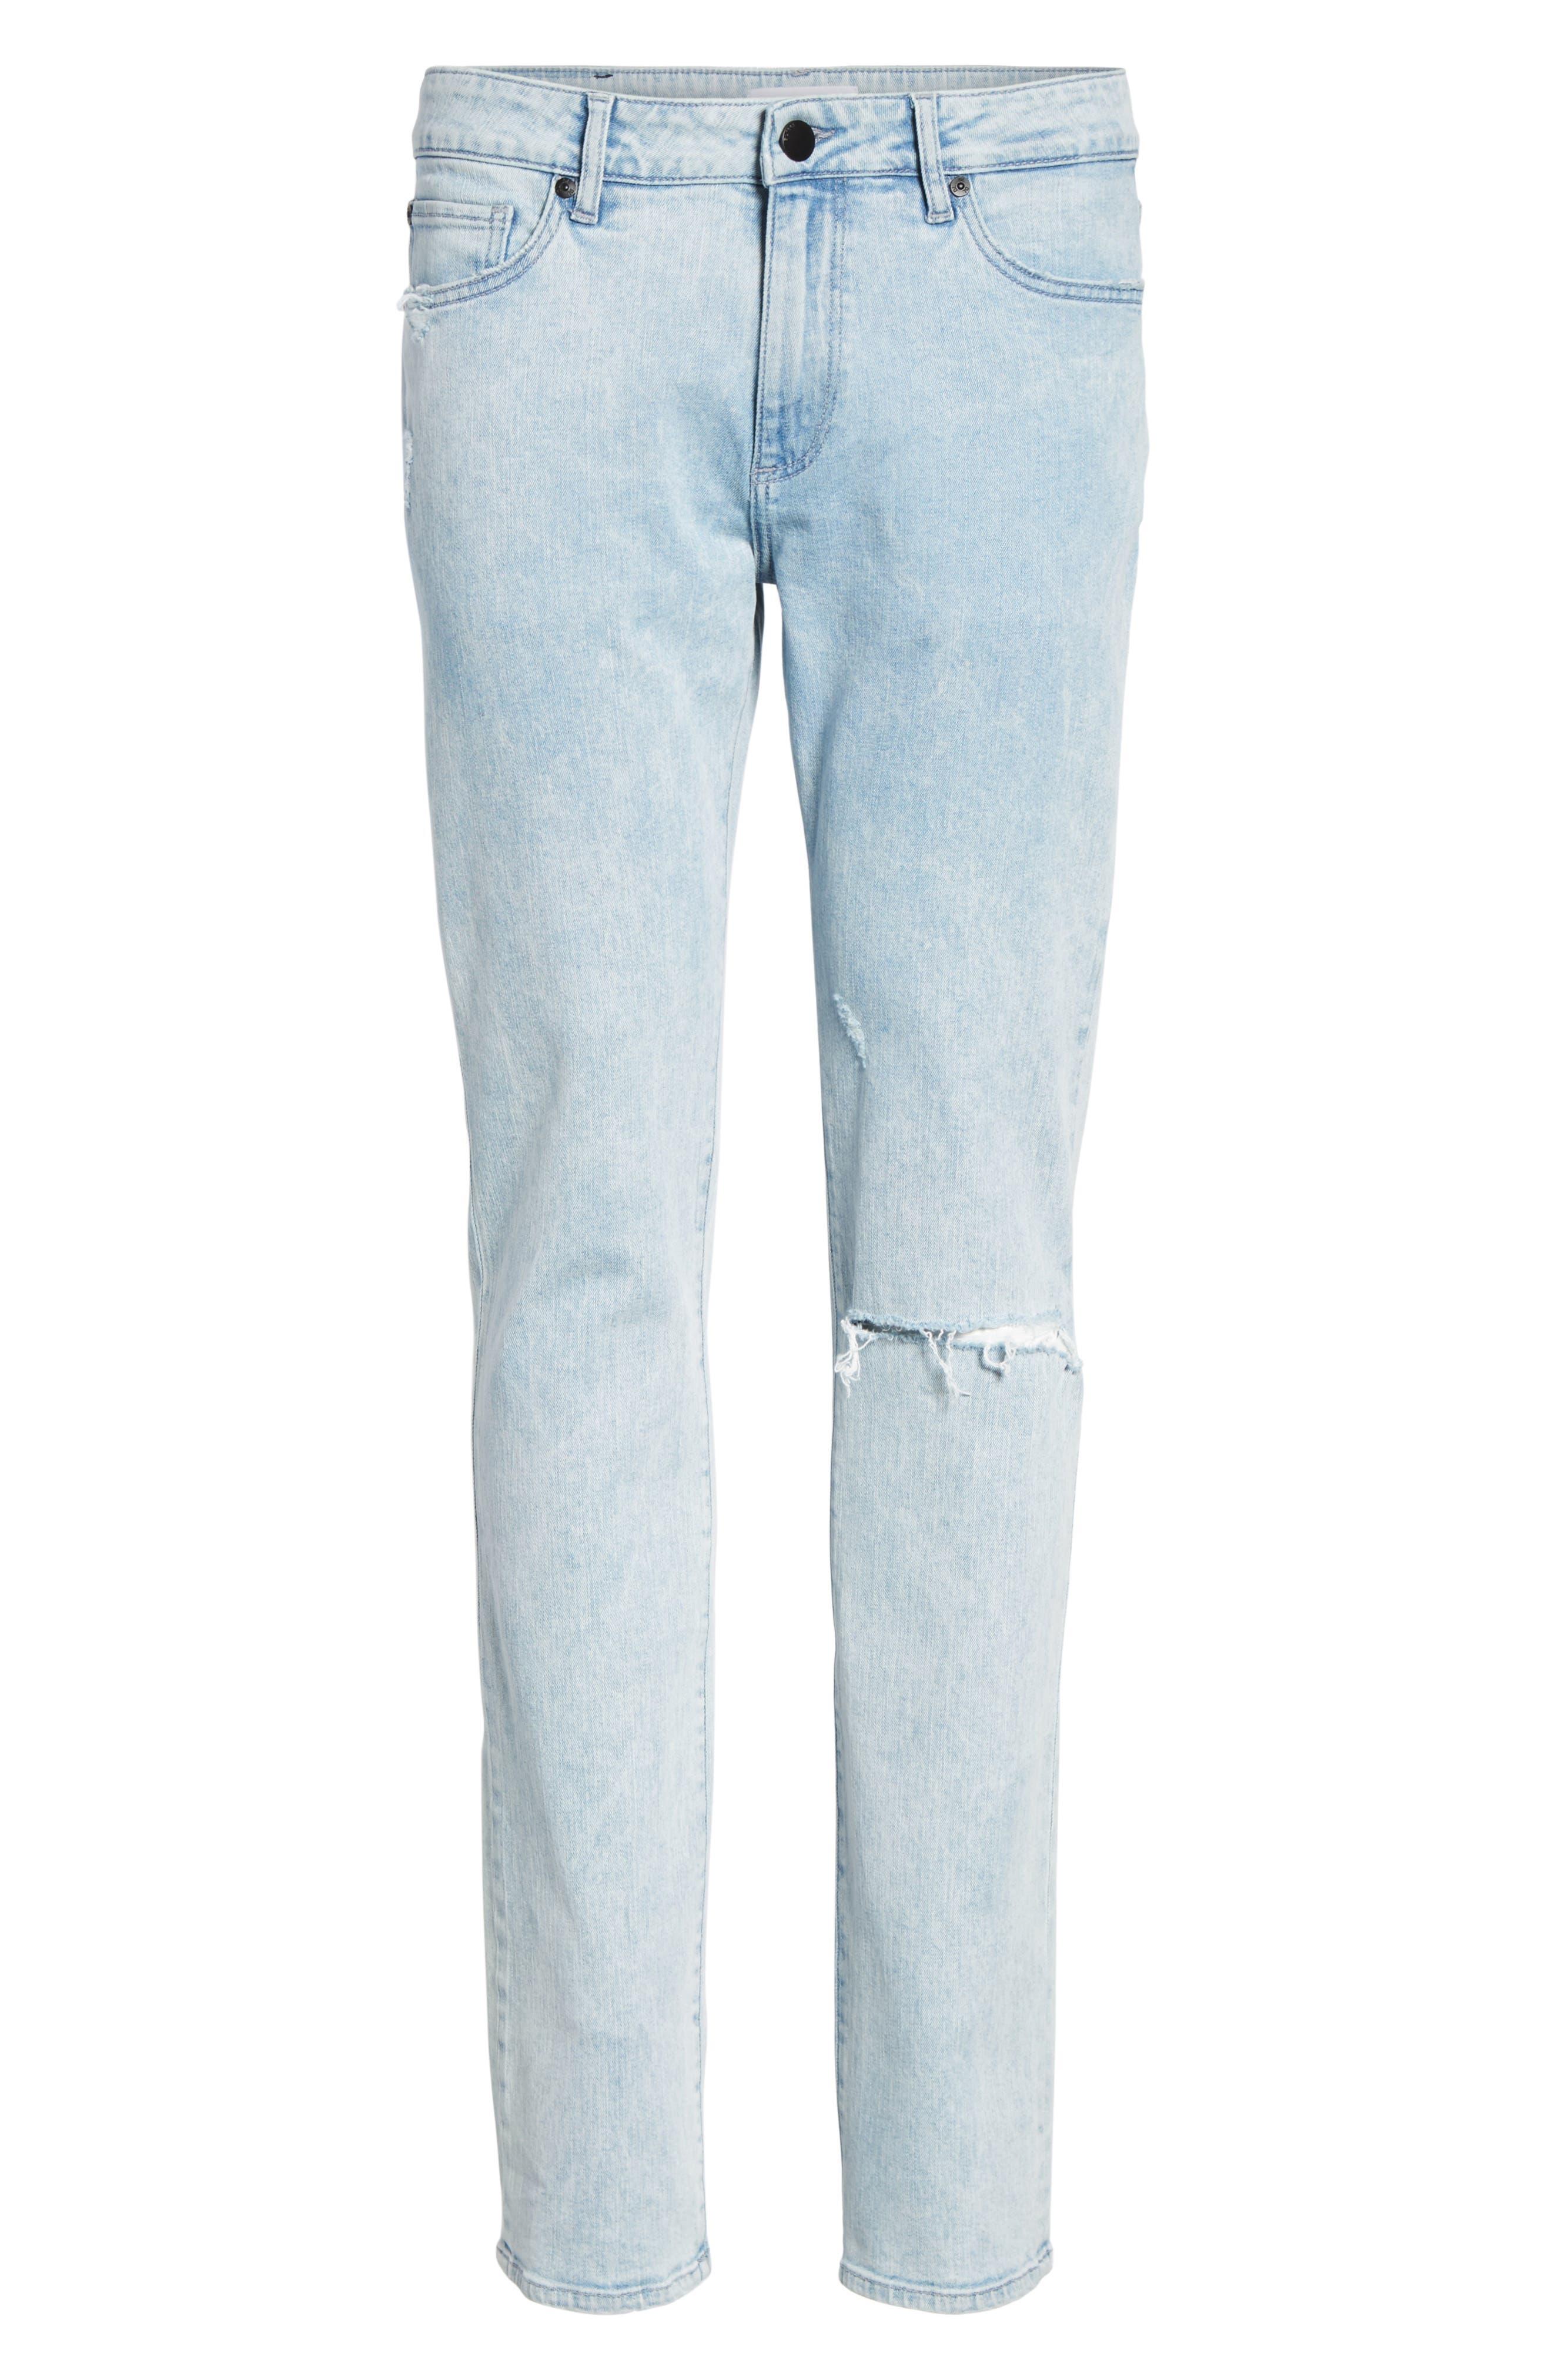 Nick Slim Fit Jeans,                             Alternate thumbnail 6, color,                             TORRENT